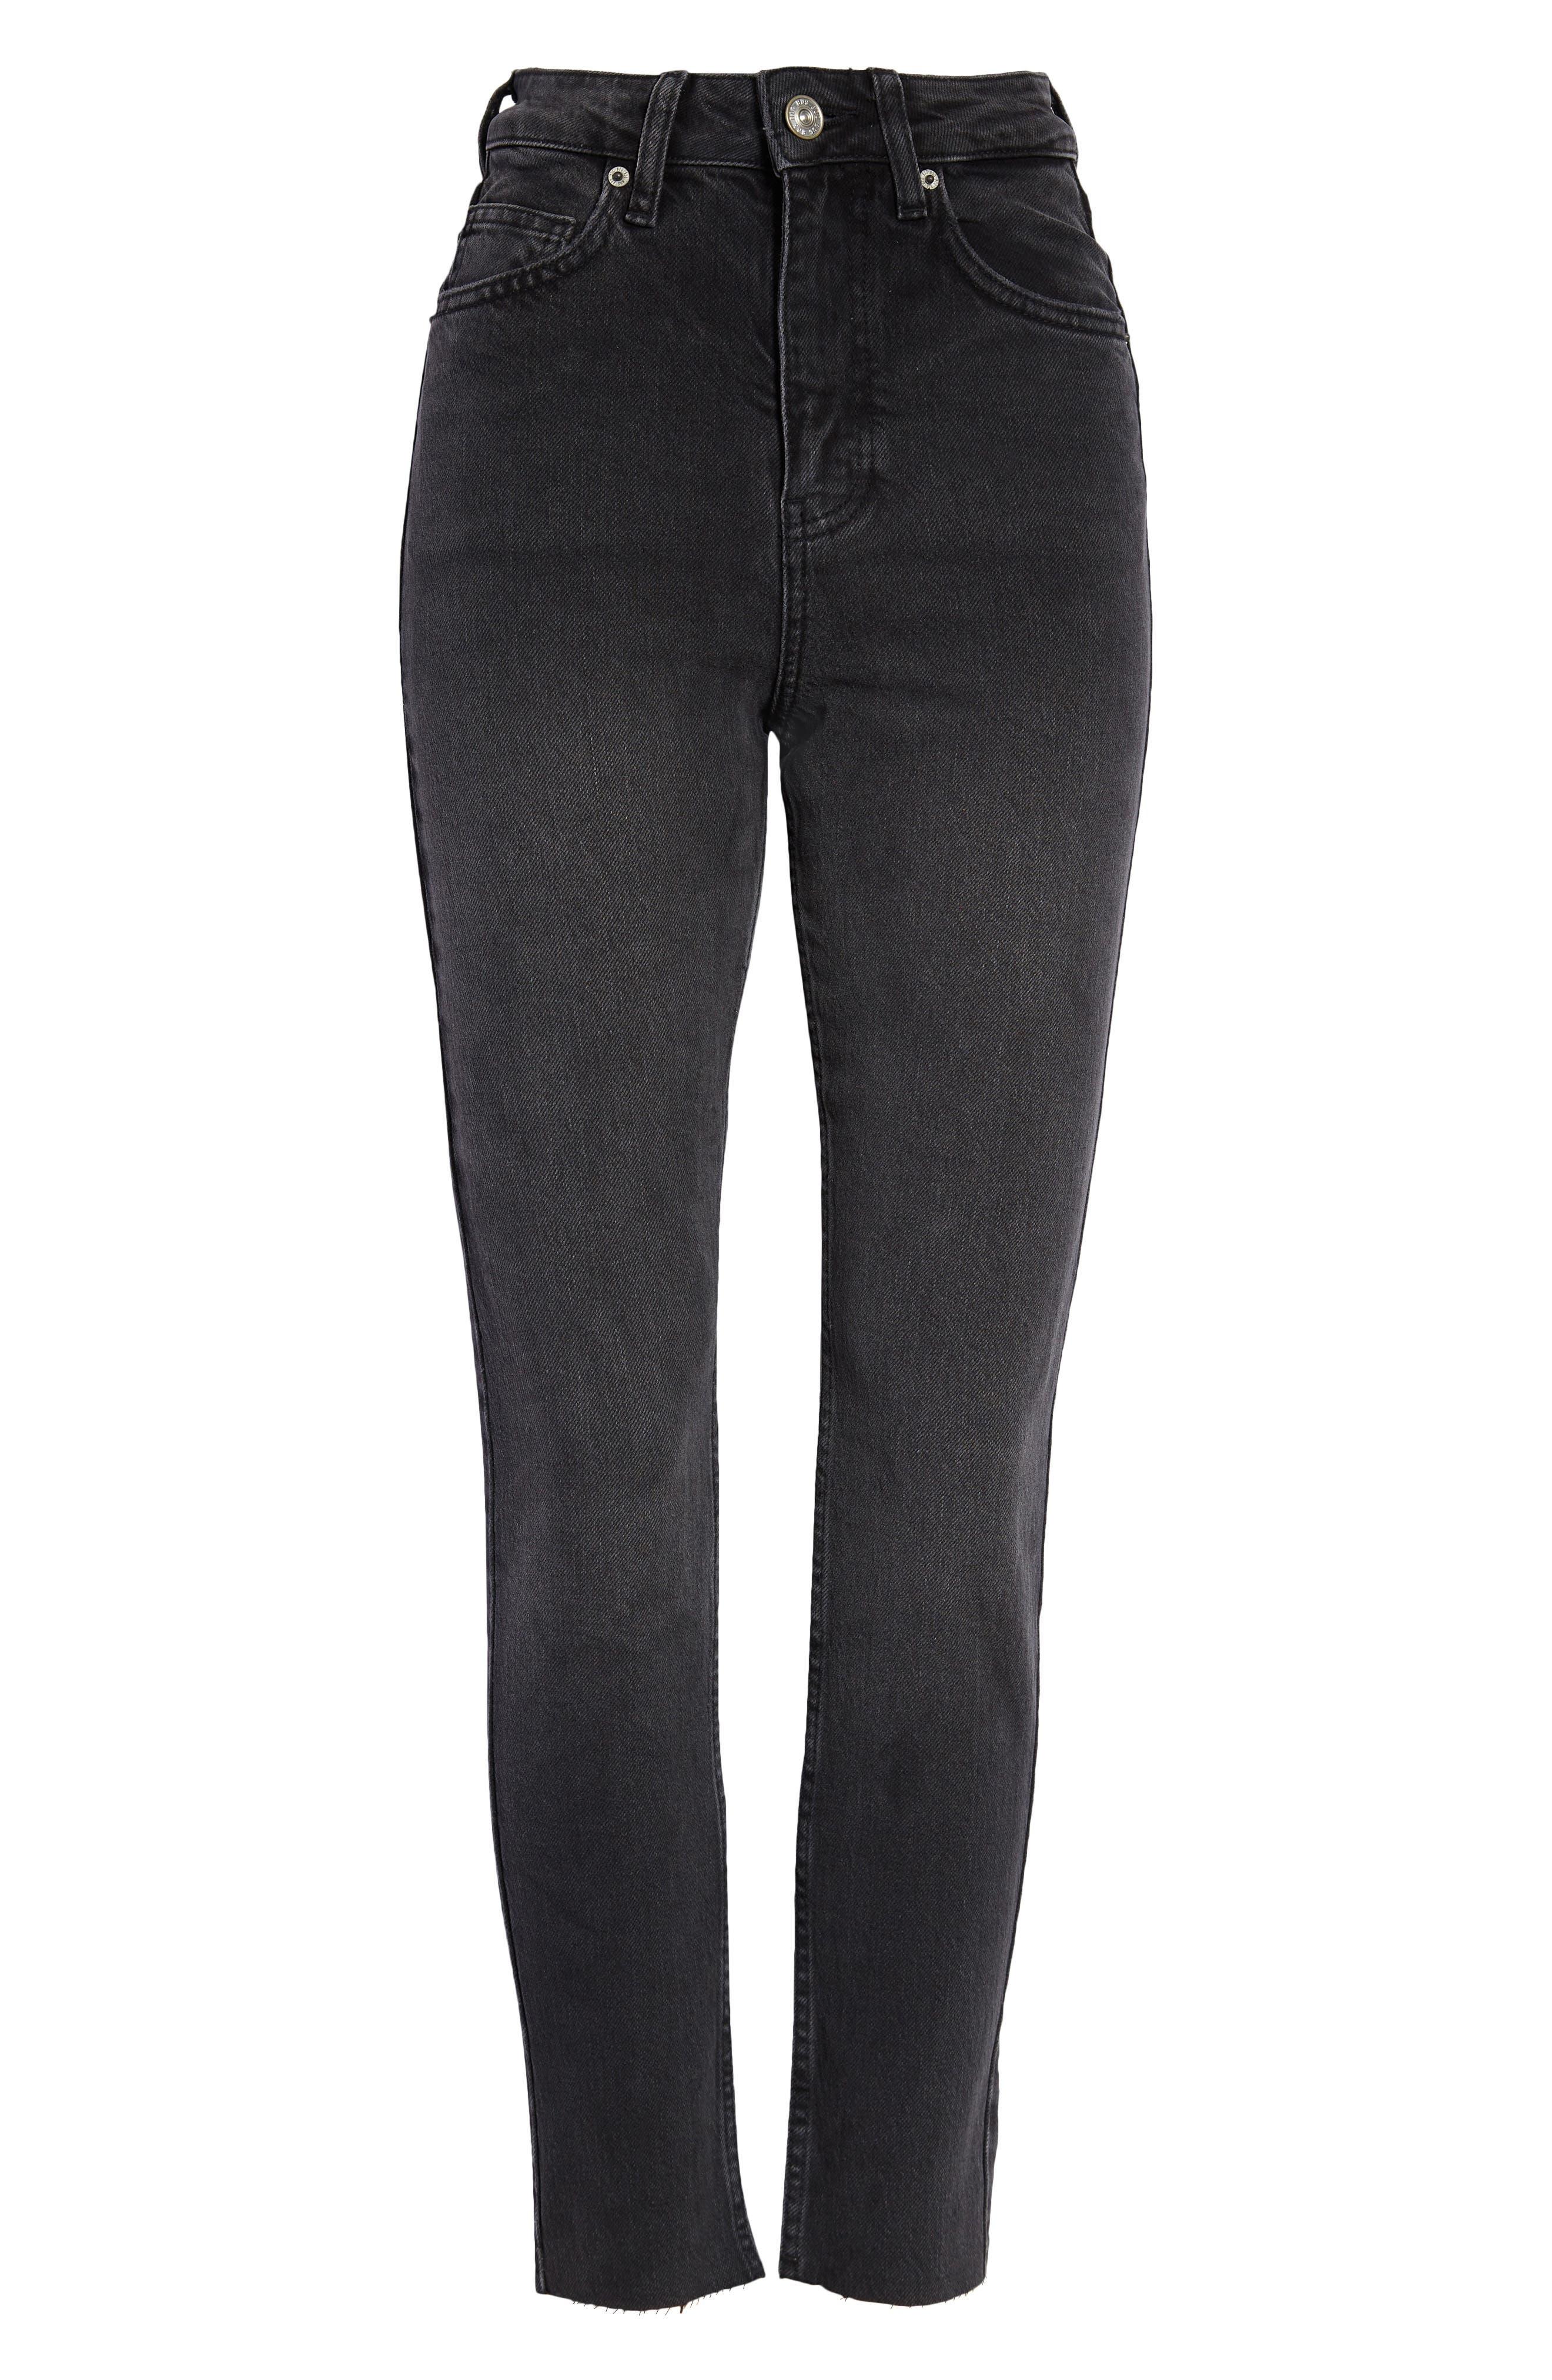 Edie Super High Waist Raw Hem Slim Jeans